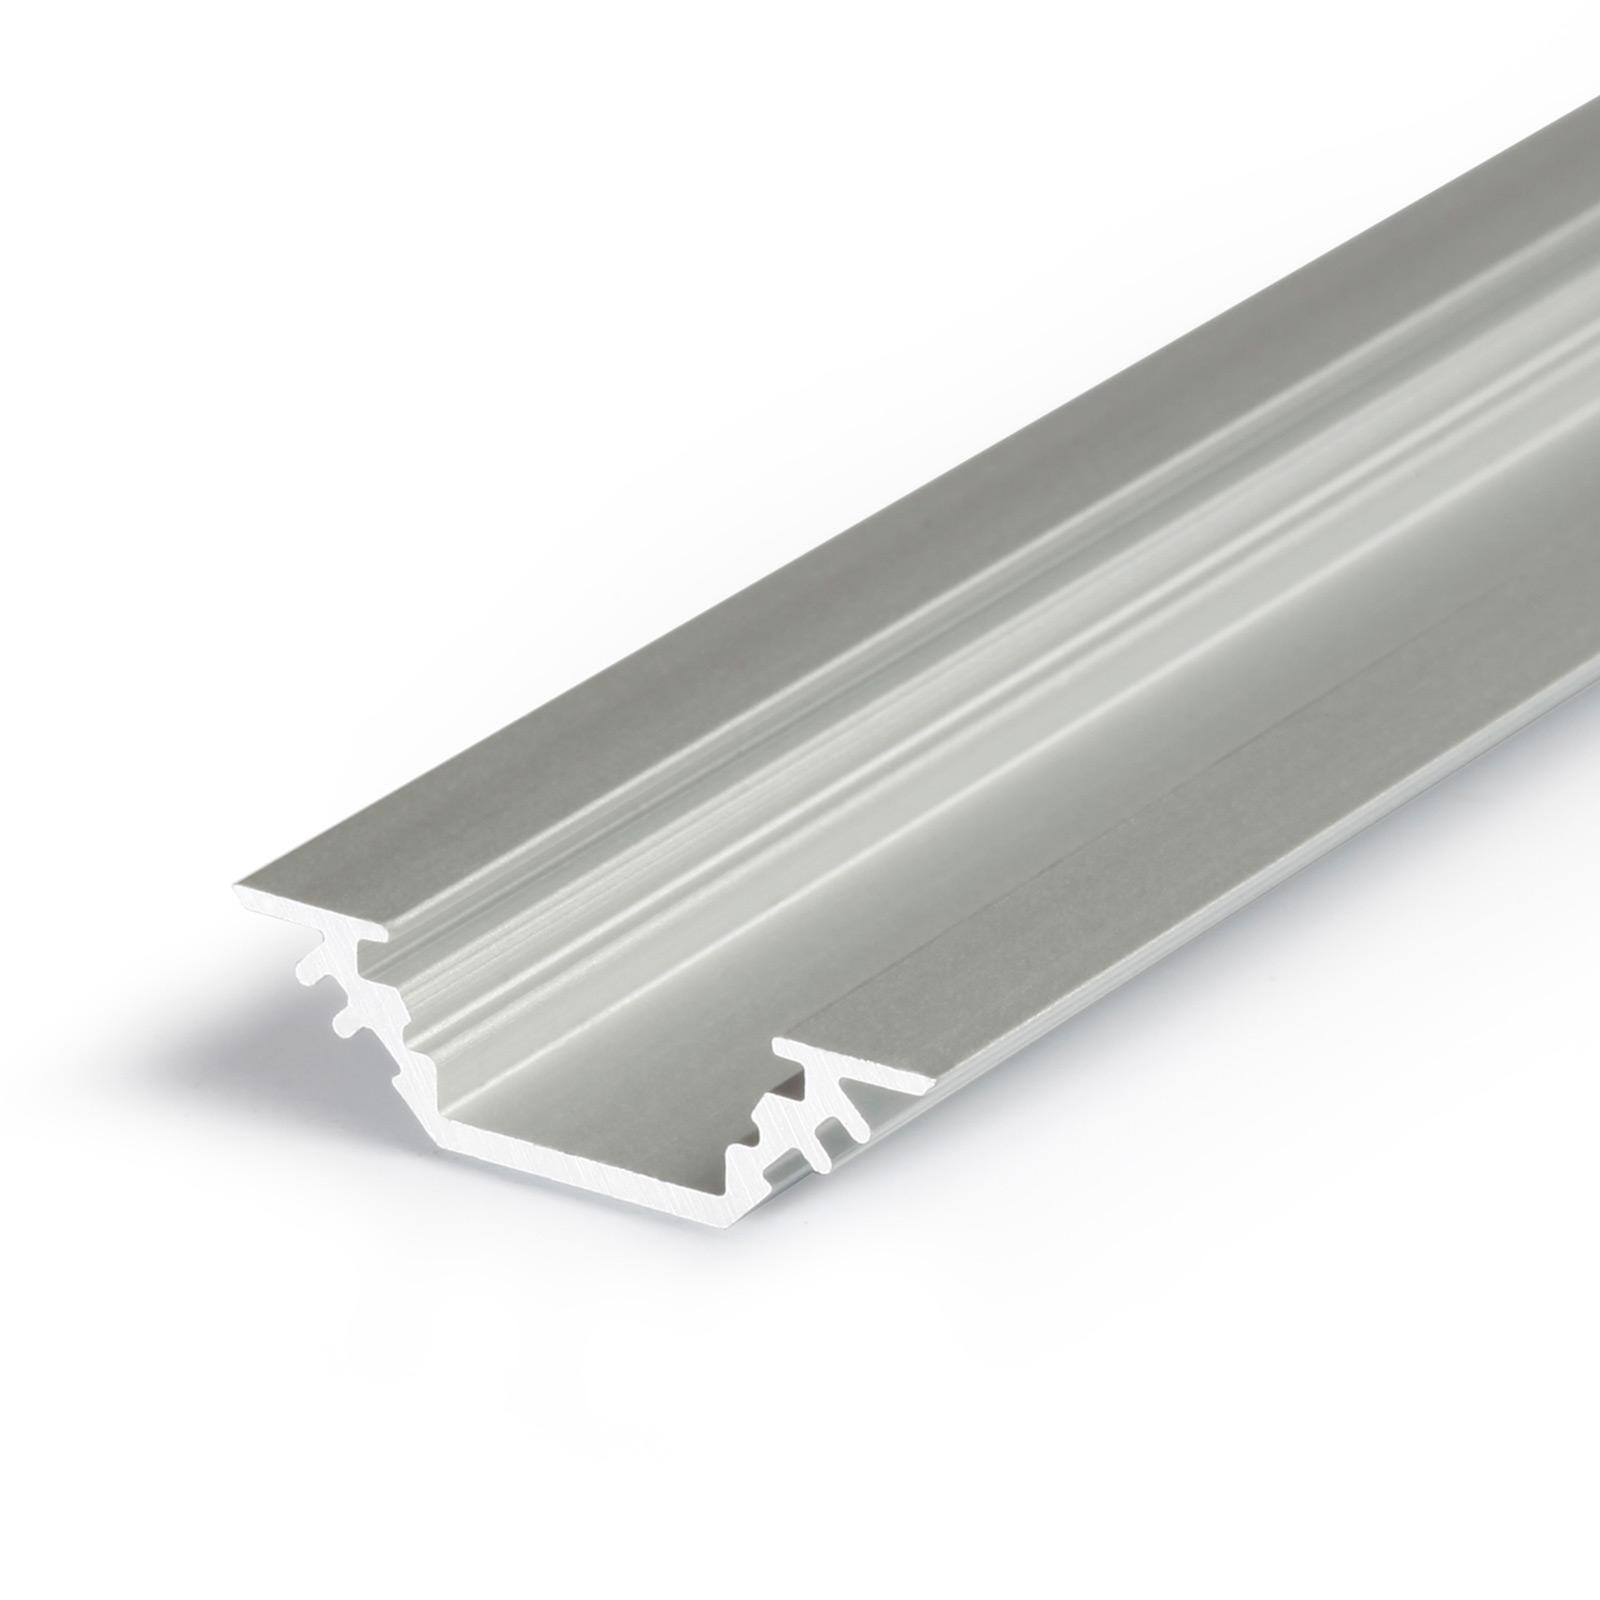 1-2 Meter LED Aufbau-Eckprofil TRIO (45°)